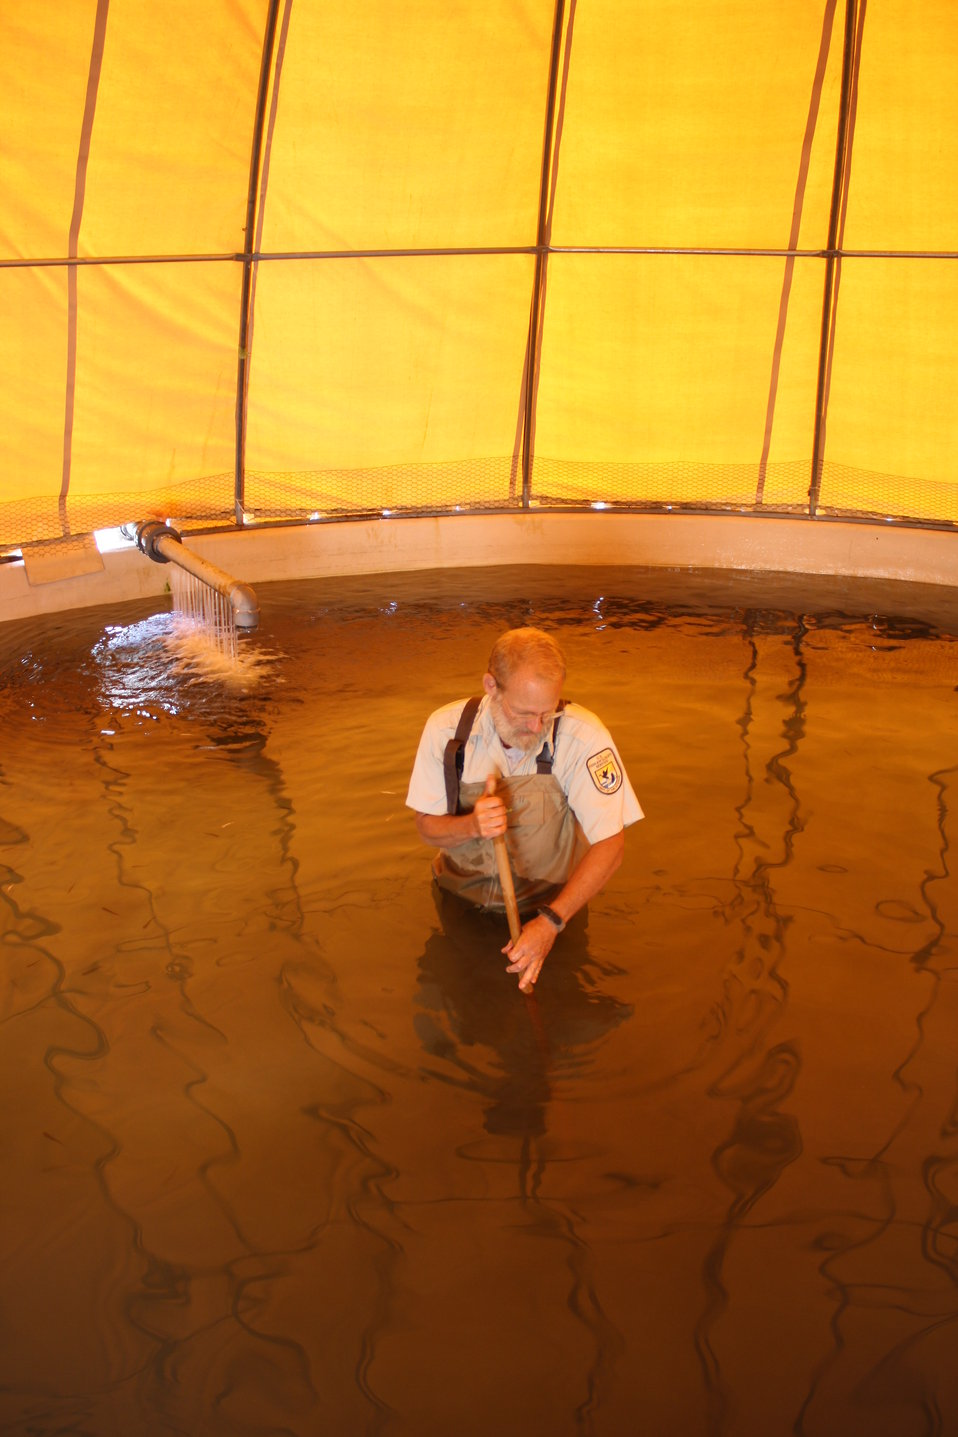 USFWS biologist cleans circular fish rearing pool of sediment